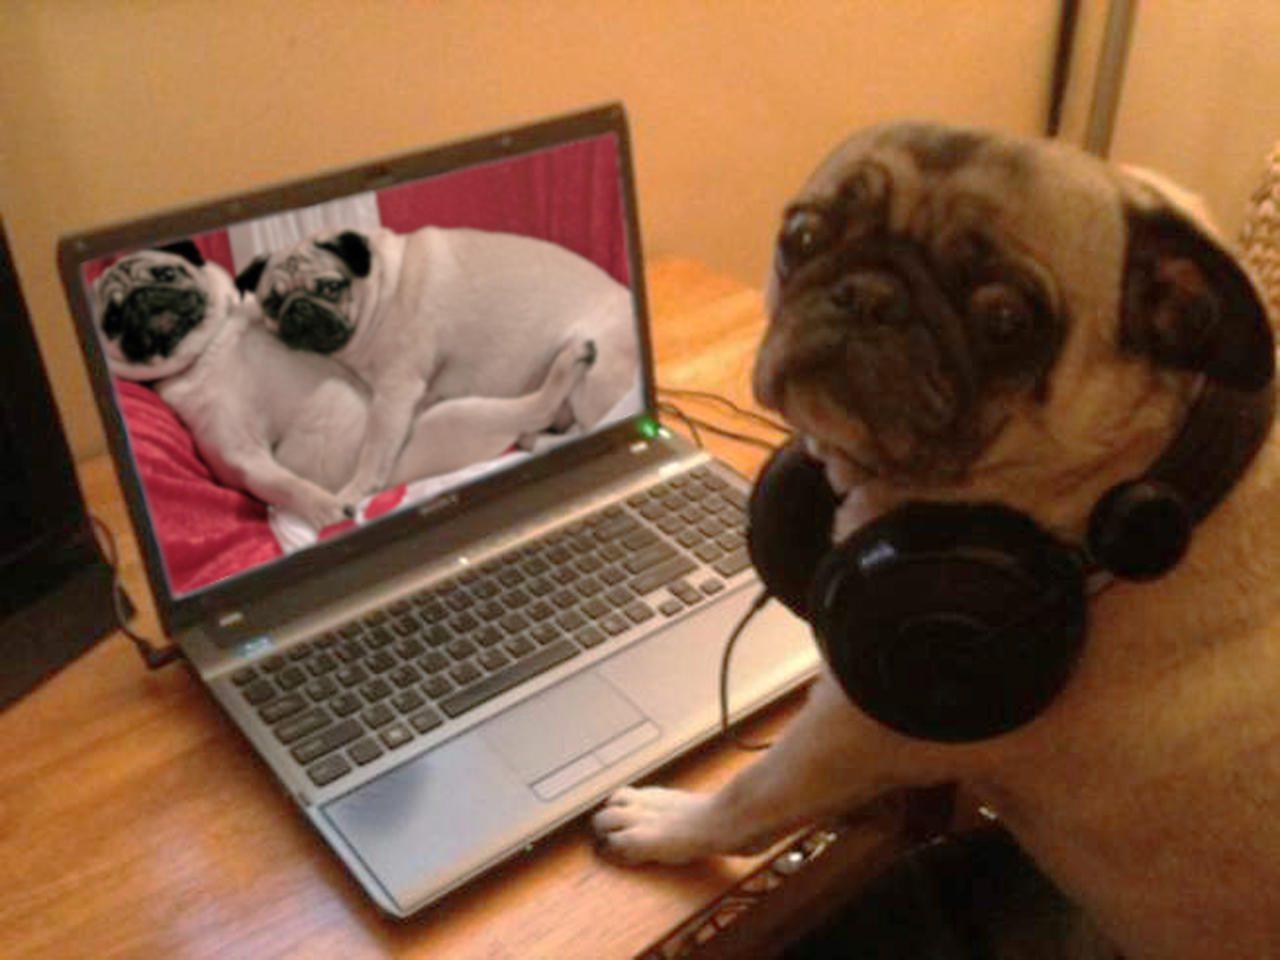 http://bipbap.ru/wp-content/uploads/2015/12/full-6351-34150-pug.jpg